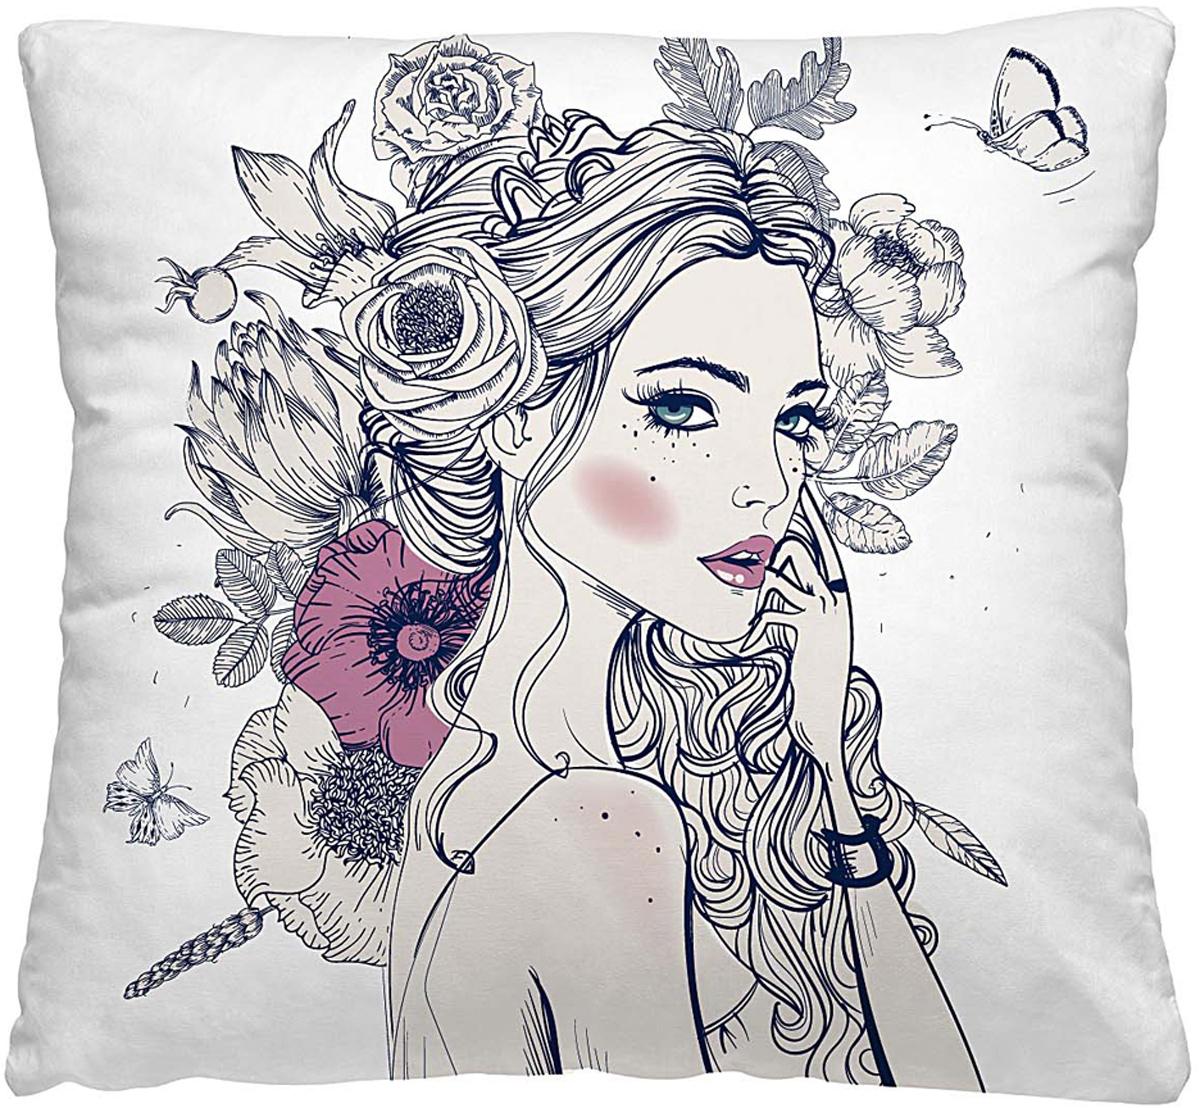 Подушка декоративная Волшебная ночь Эльвира, 40 х 40 см подушка декоративная волшебная ночь колибри 40х40 см